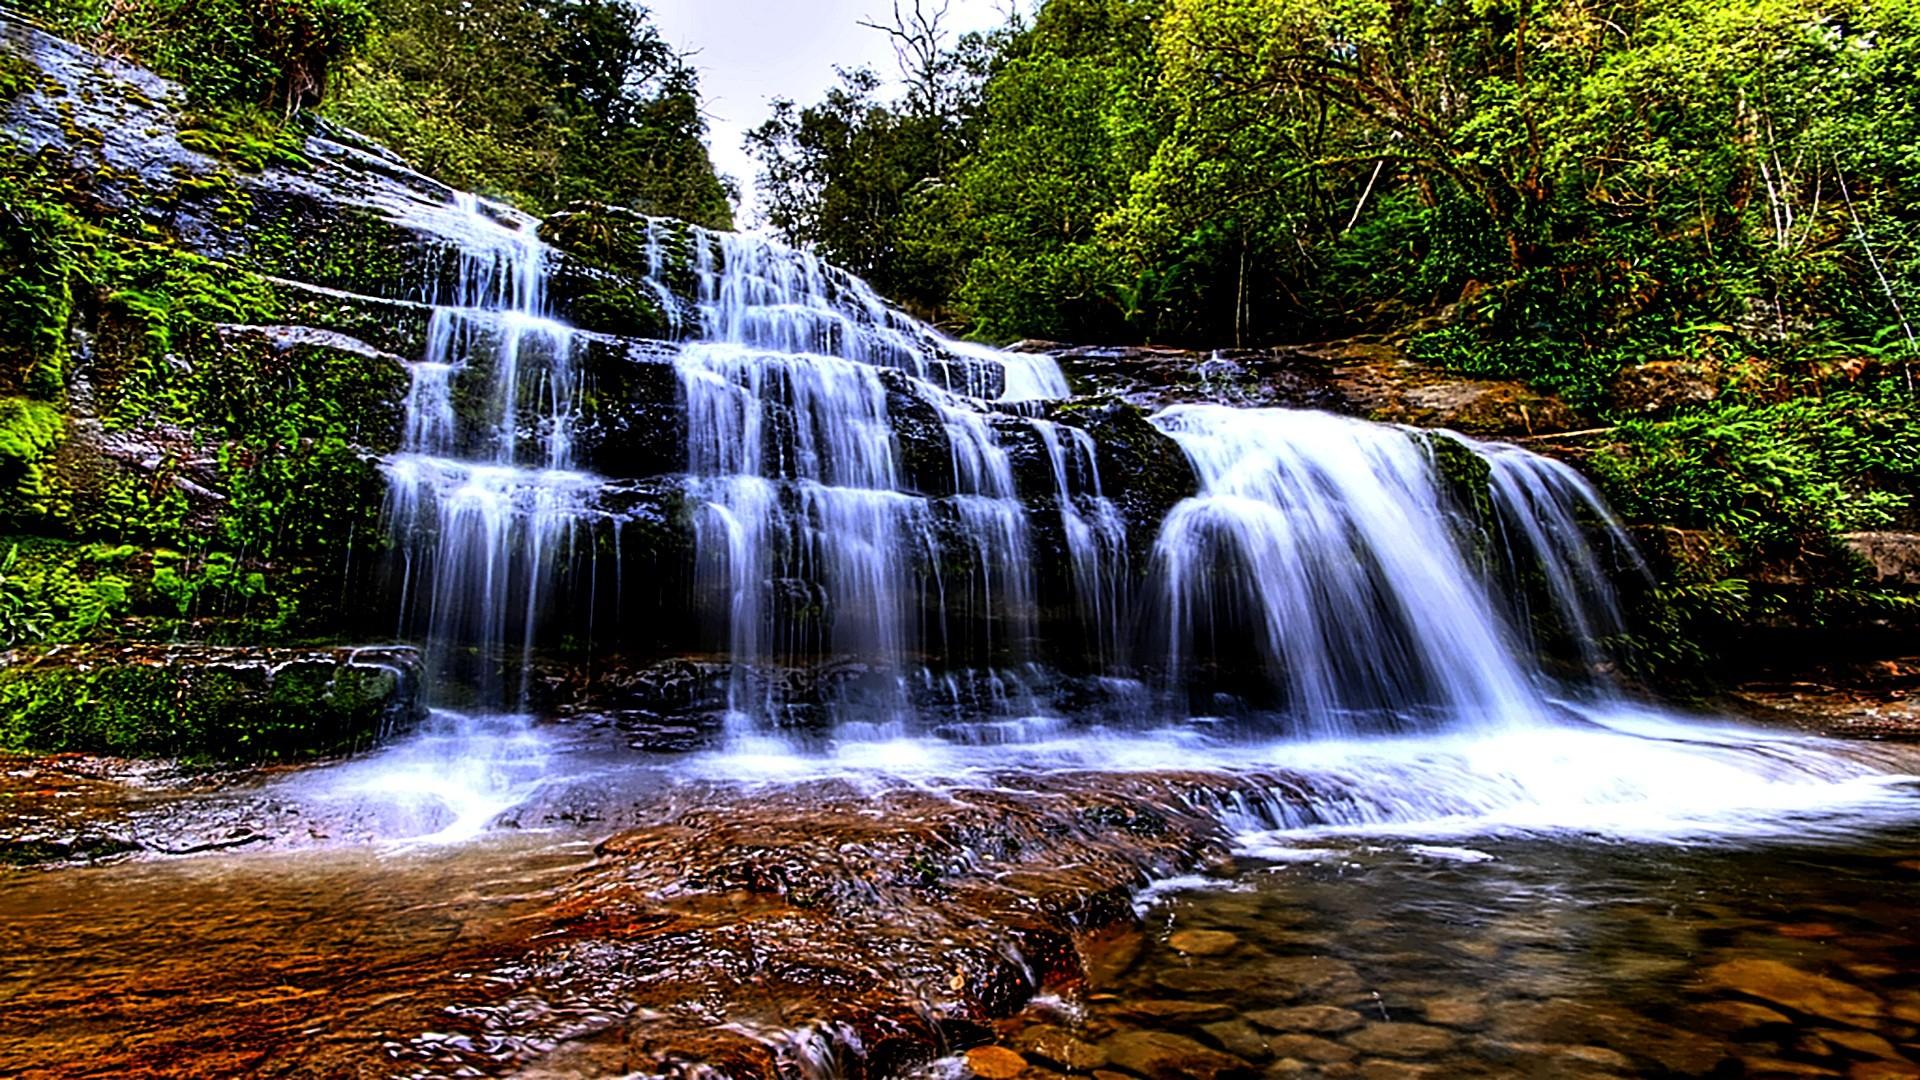 Free Live Waterfall Wallpaper Downloads